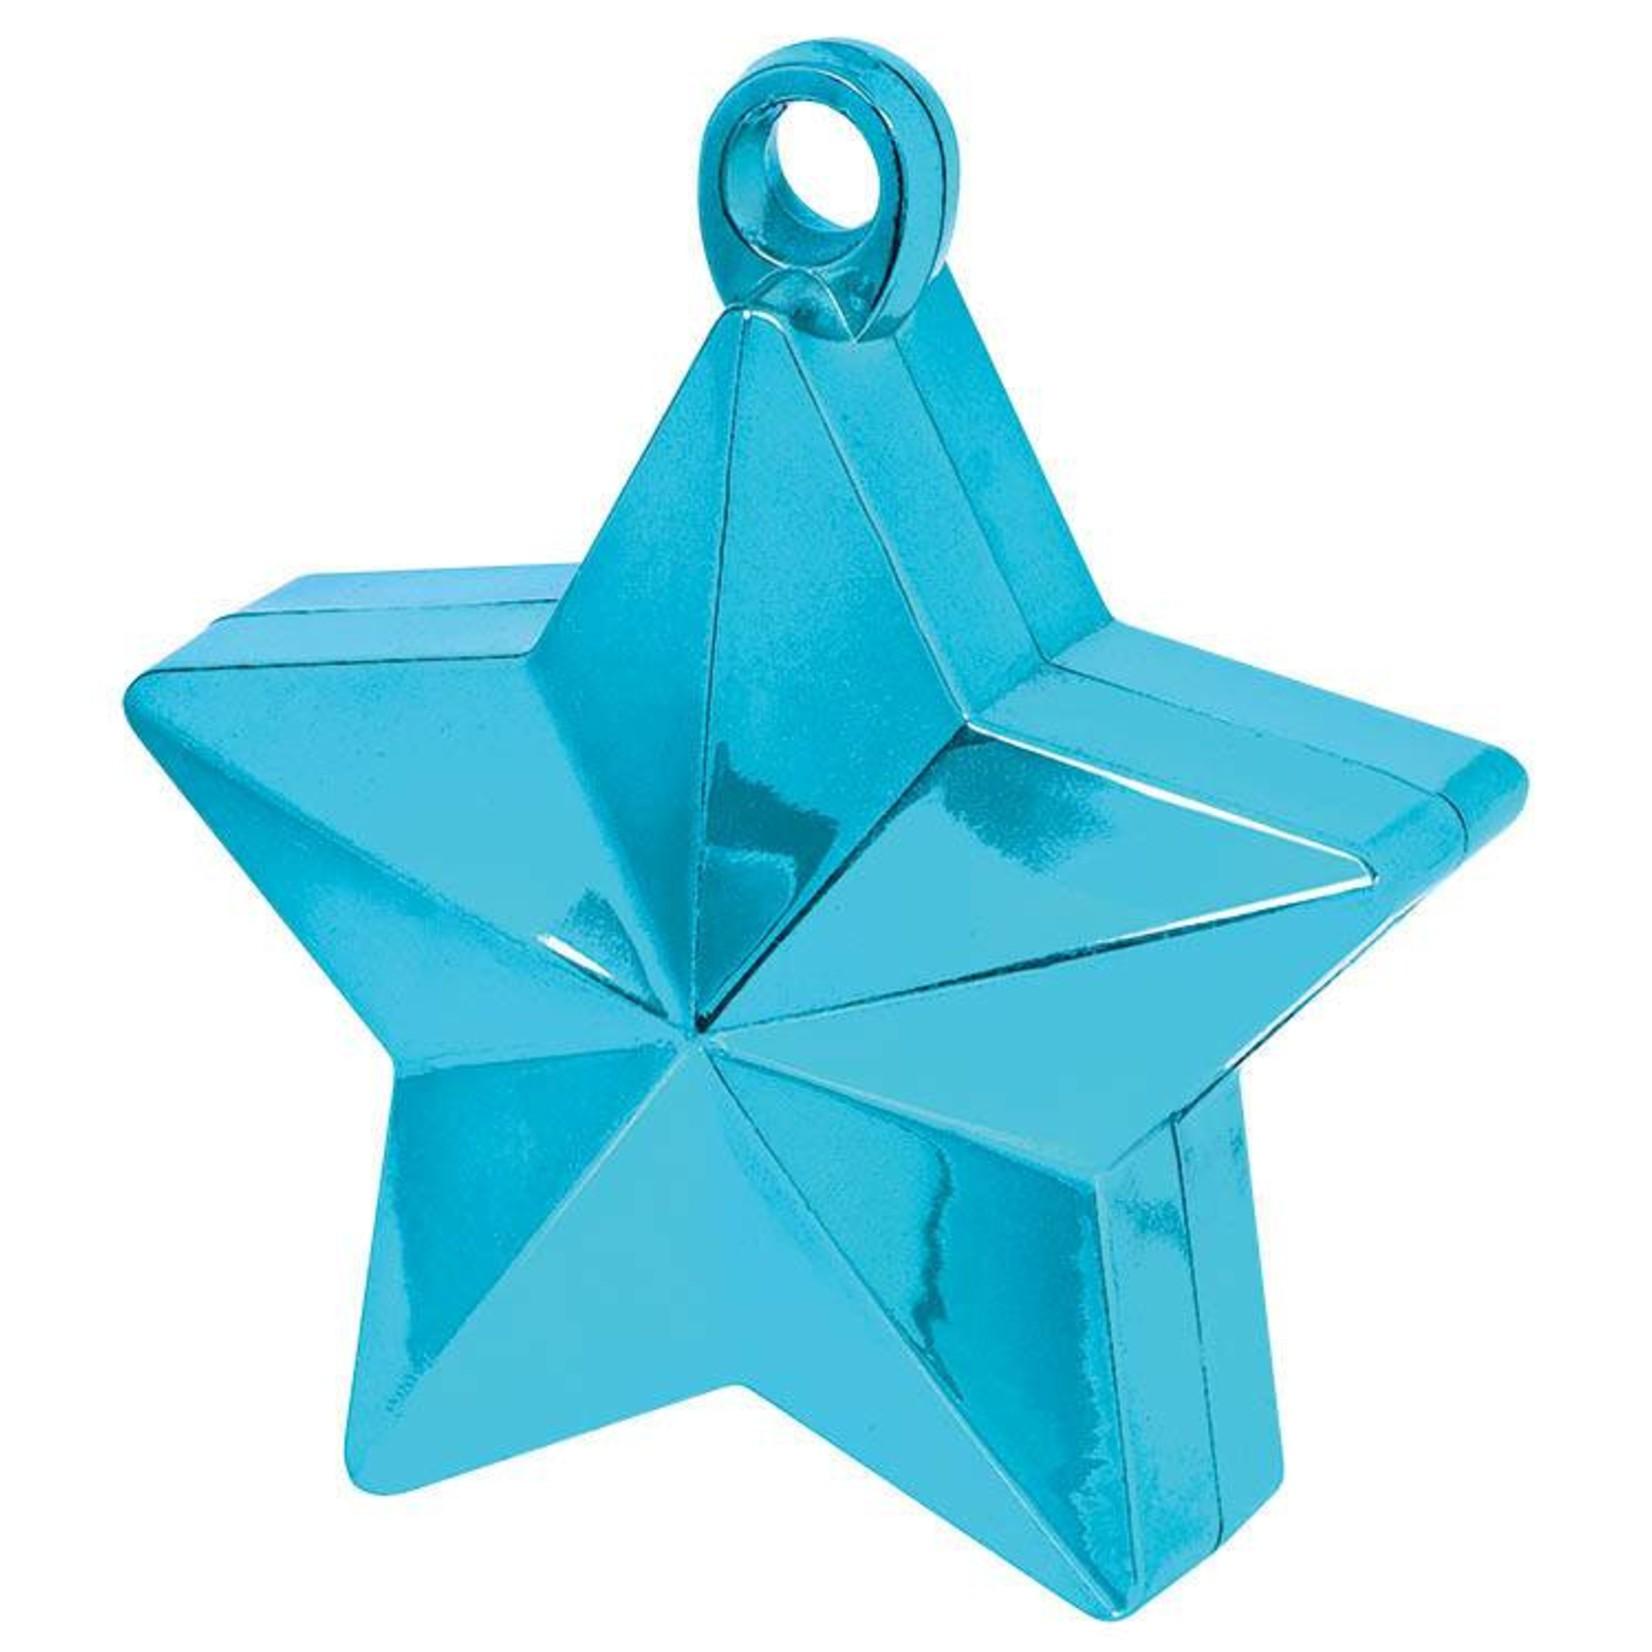 Balloon Weight-Star-Caribbean Blue-6oz